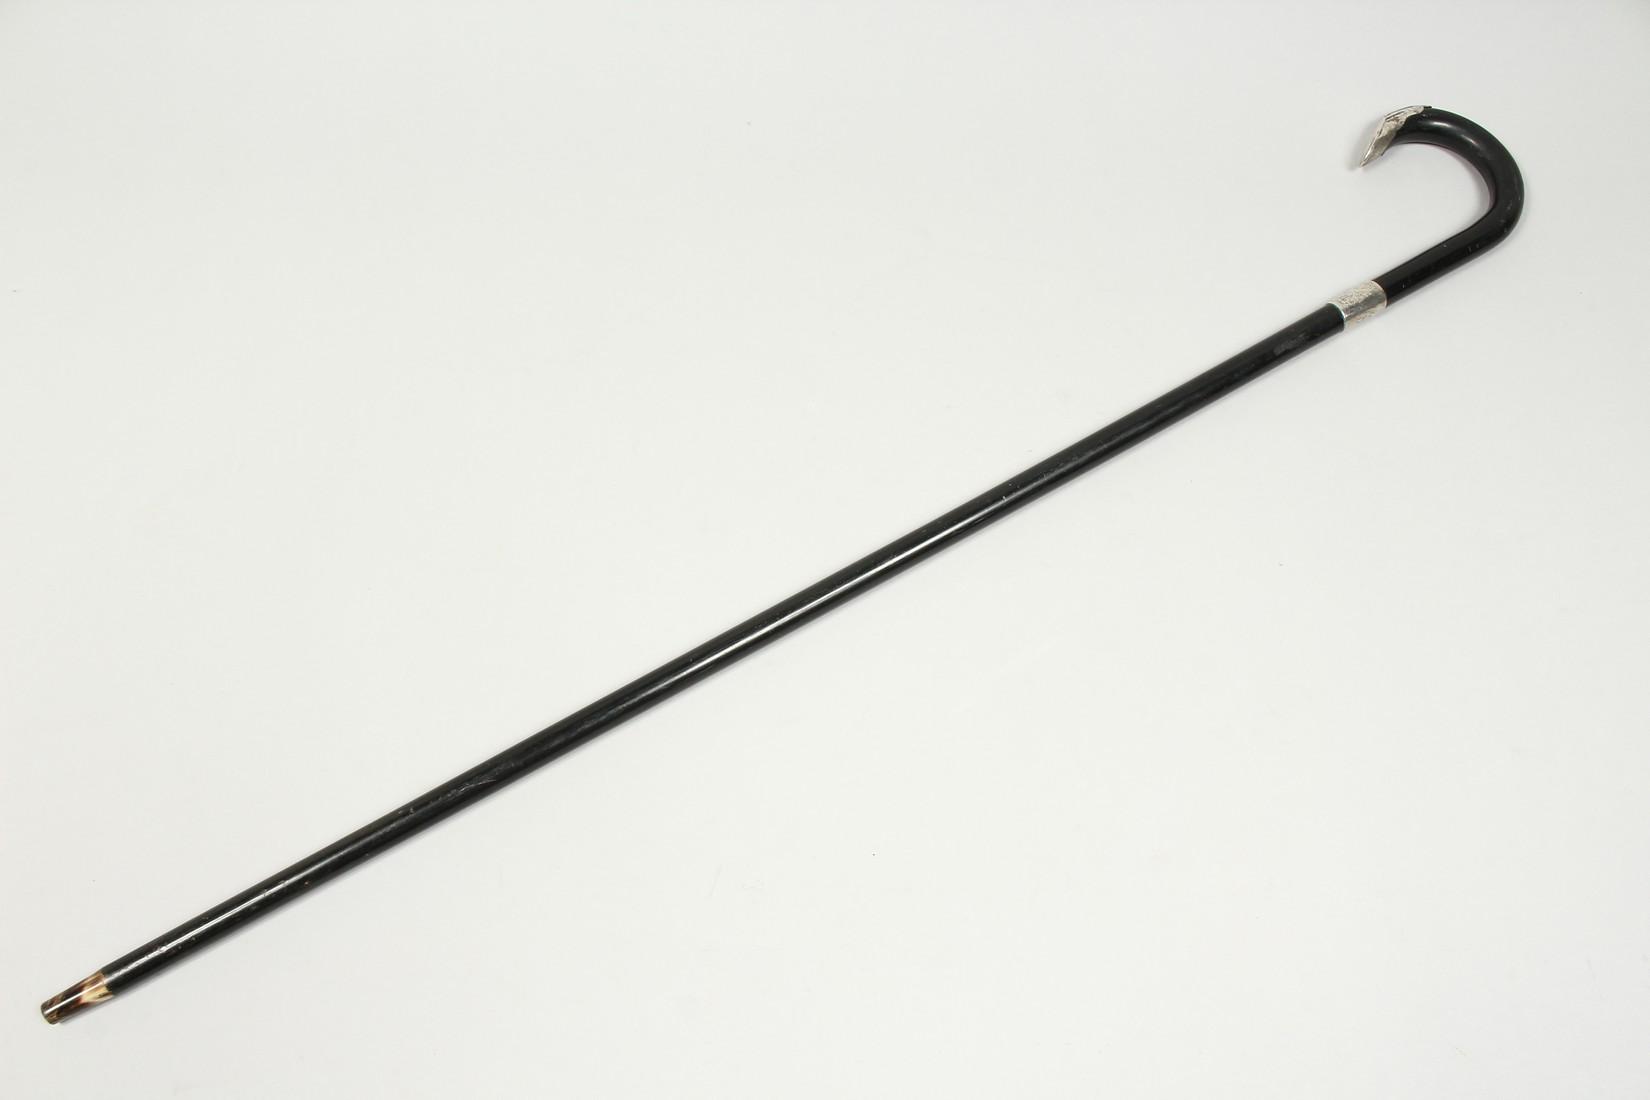 AN EBONY SILVER MOUNTED WALKING STICK, LONDON 1933. 36ins long. - Image 10 of 10